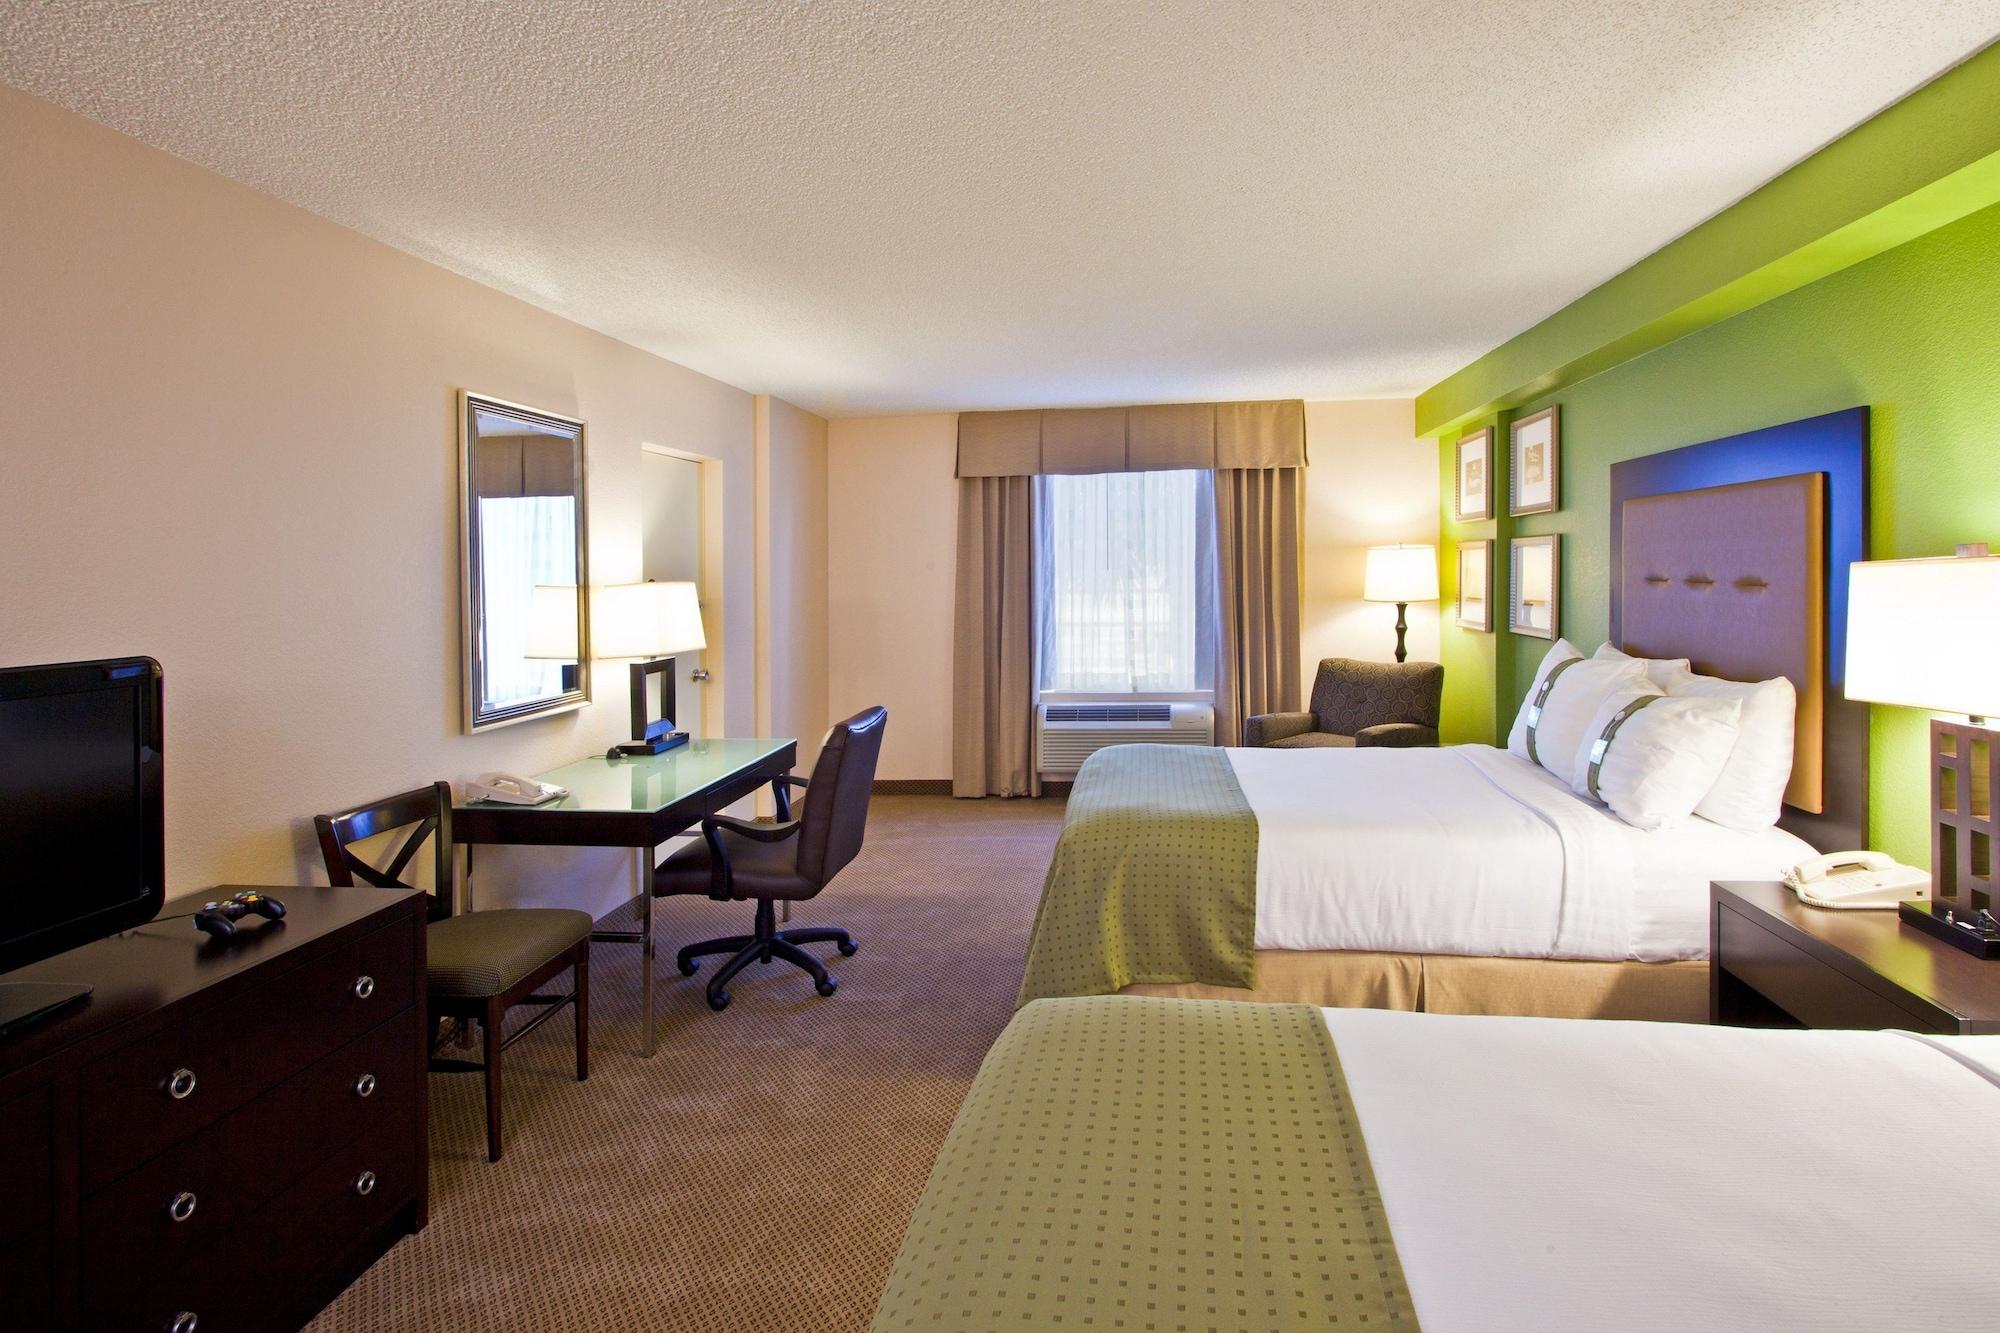 Holiday Inn & Suites Across From Universal Orlando, Orange